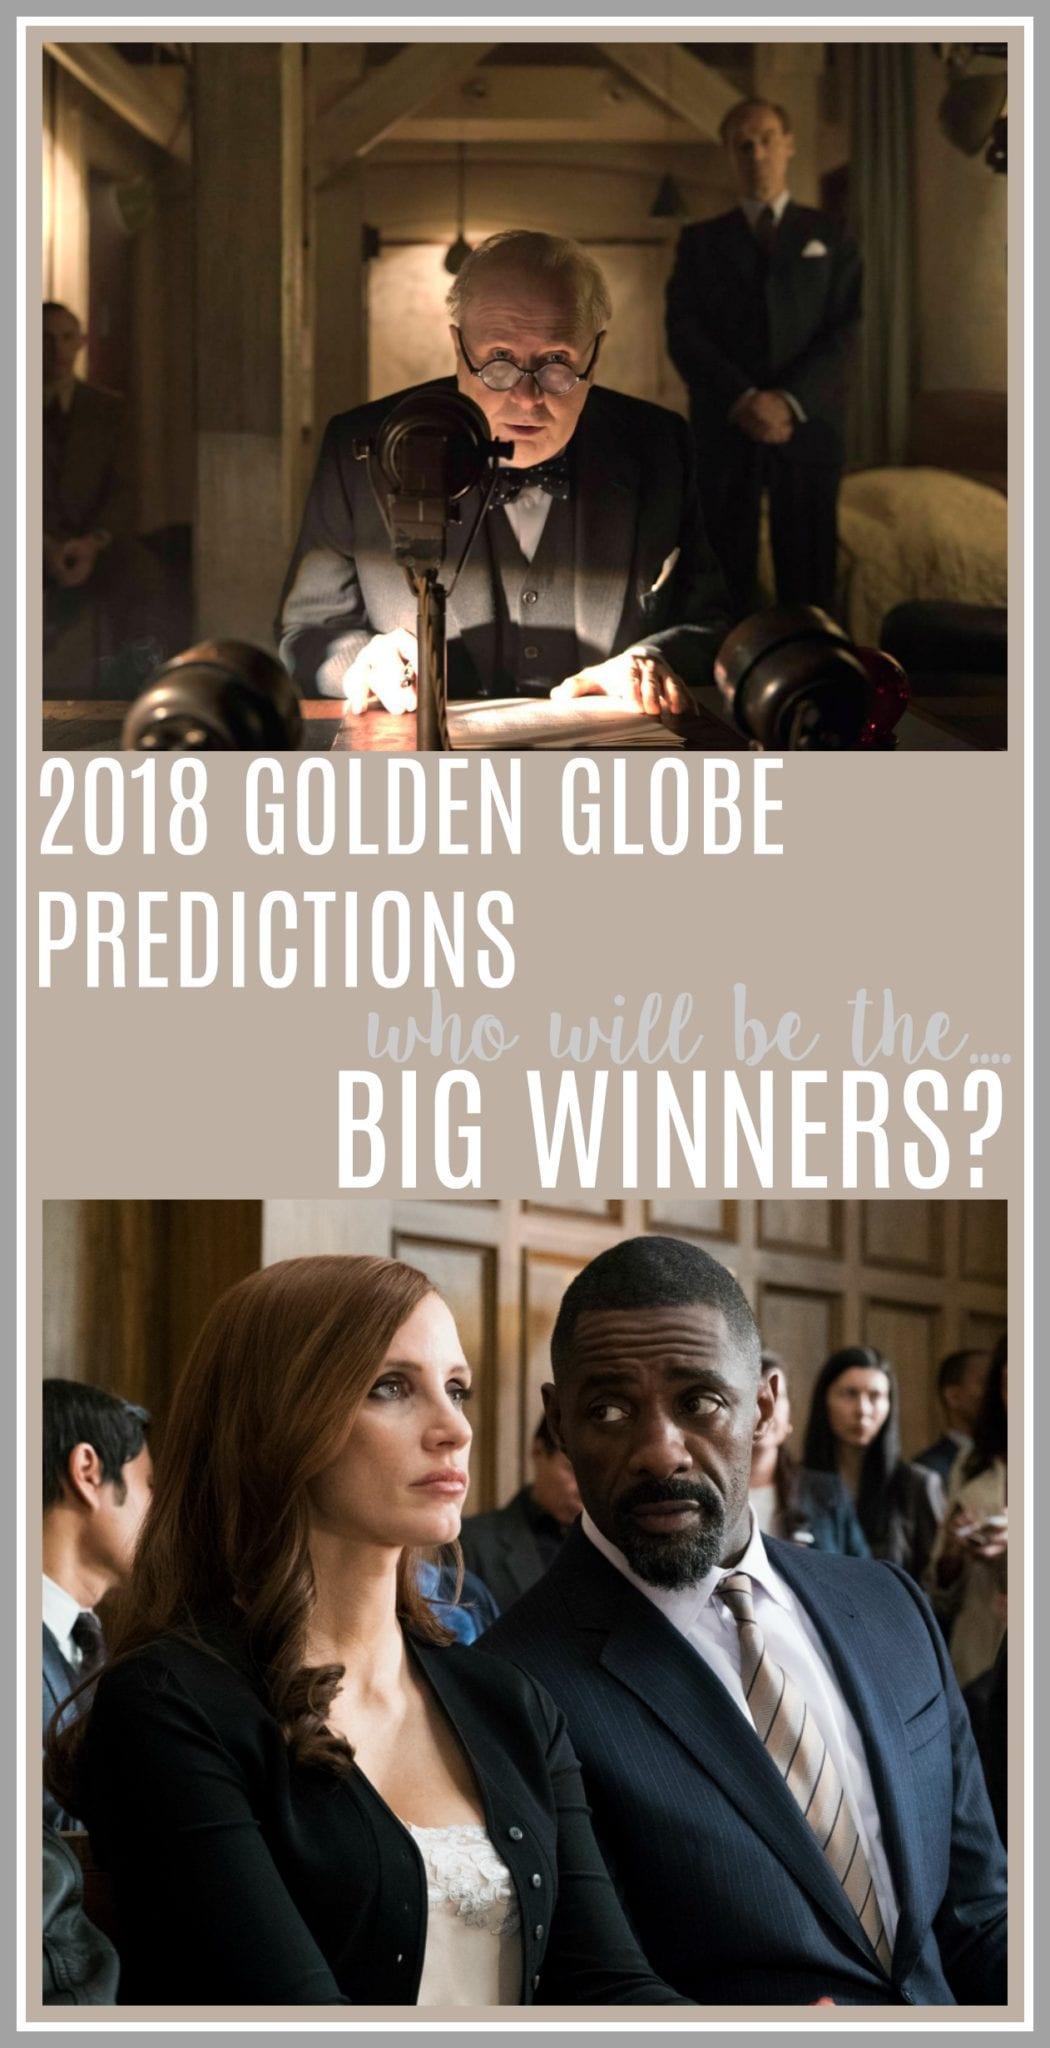 golden globes, golden globes predictions, winners